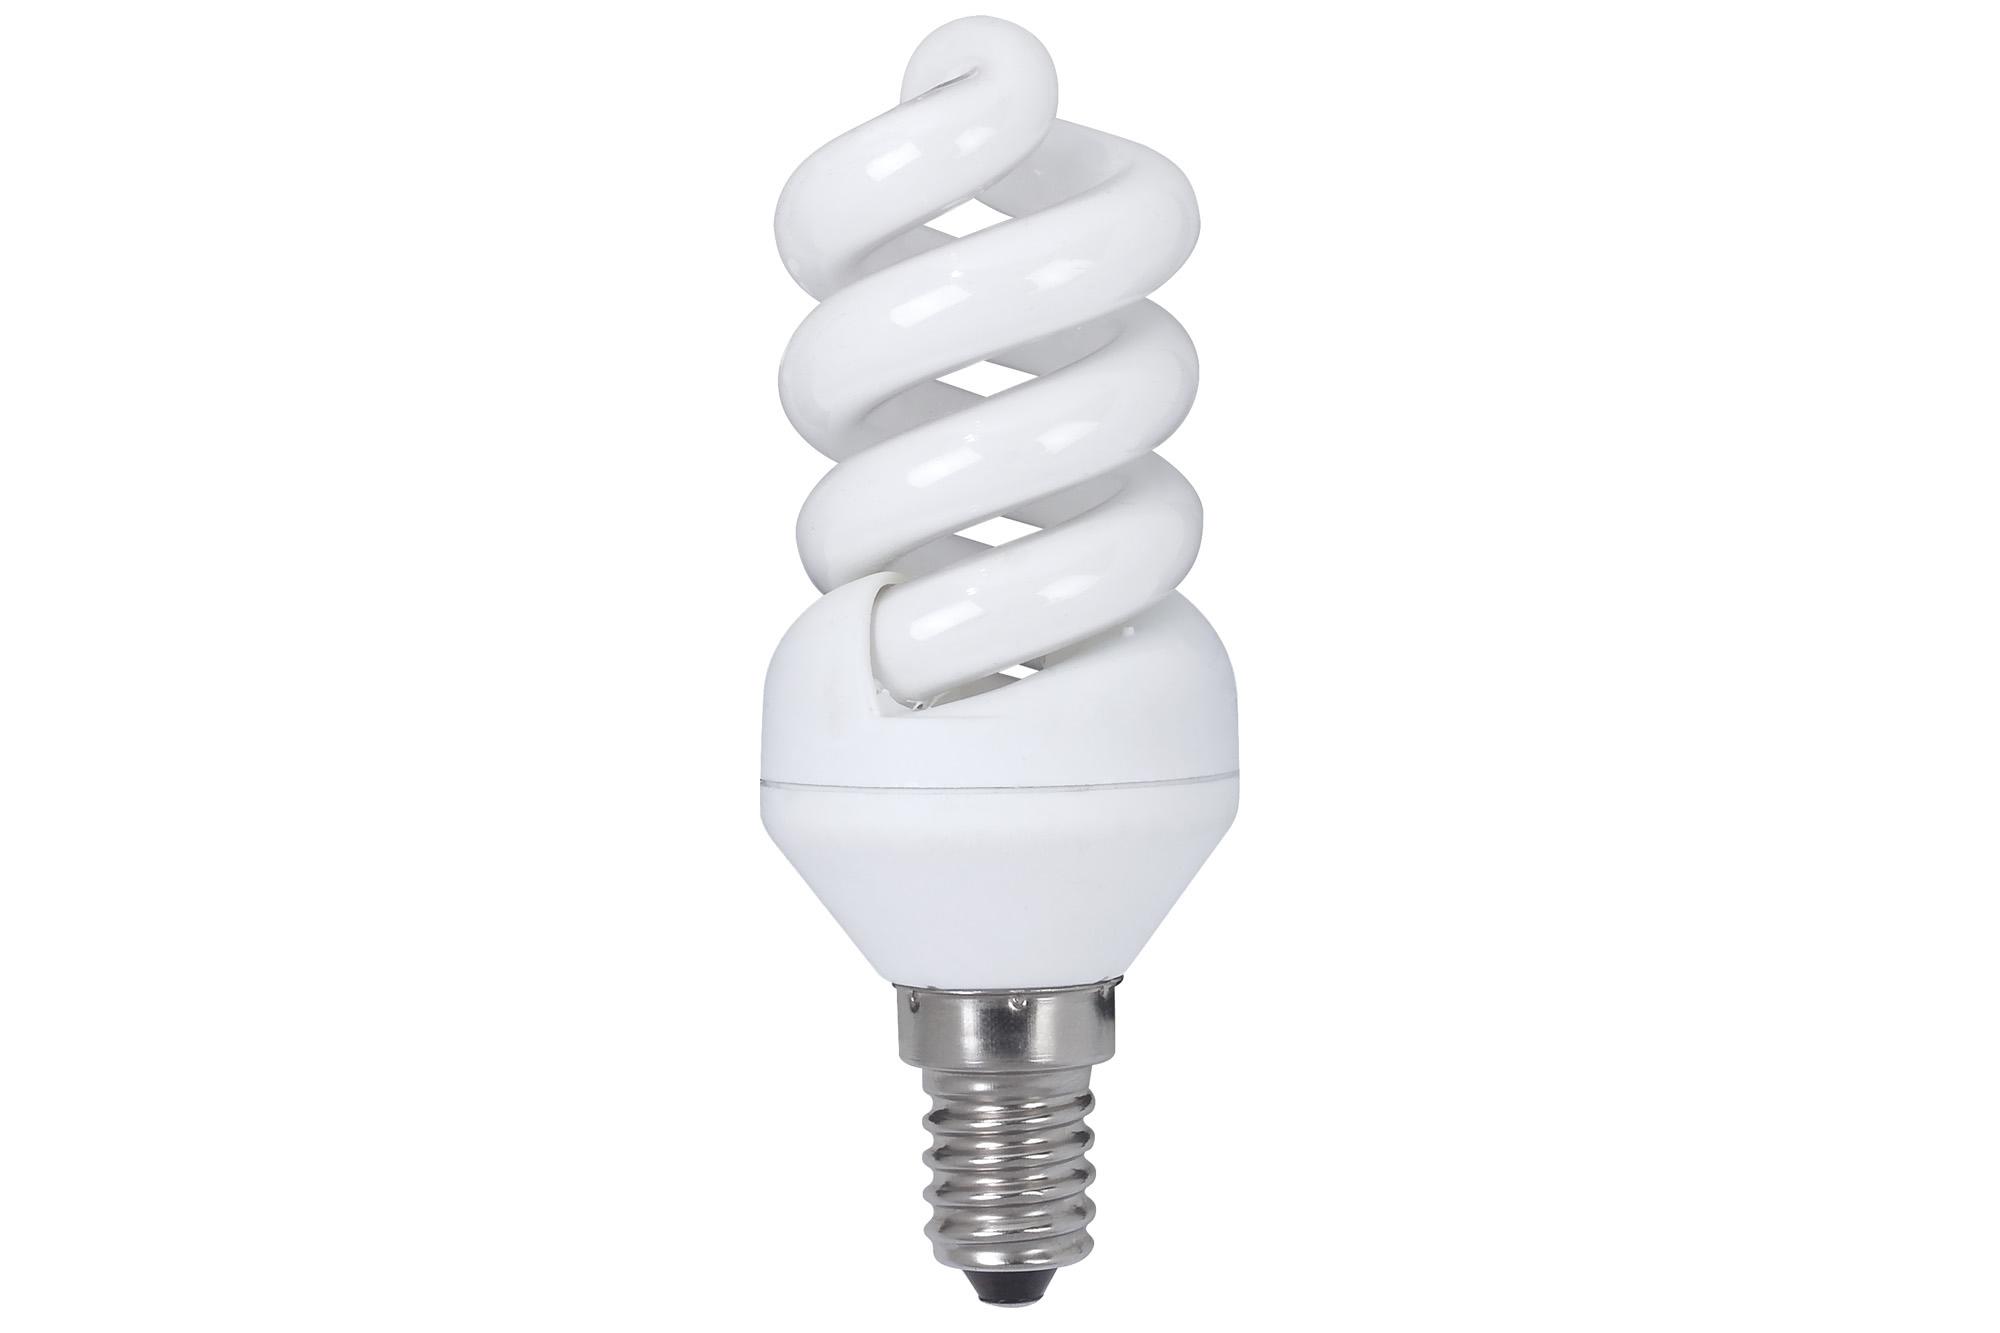 Paulmann. 89439 Лампа энергосберегающая, спираль 9W E14 теплый бел., экстра